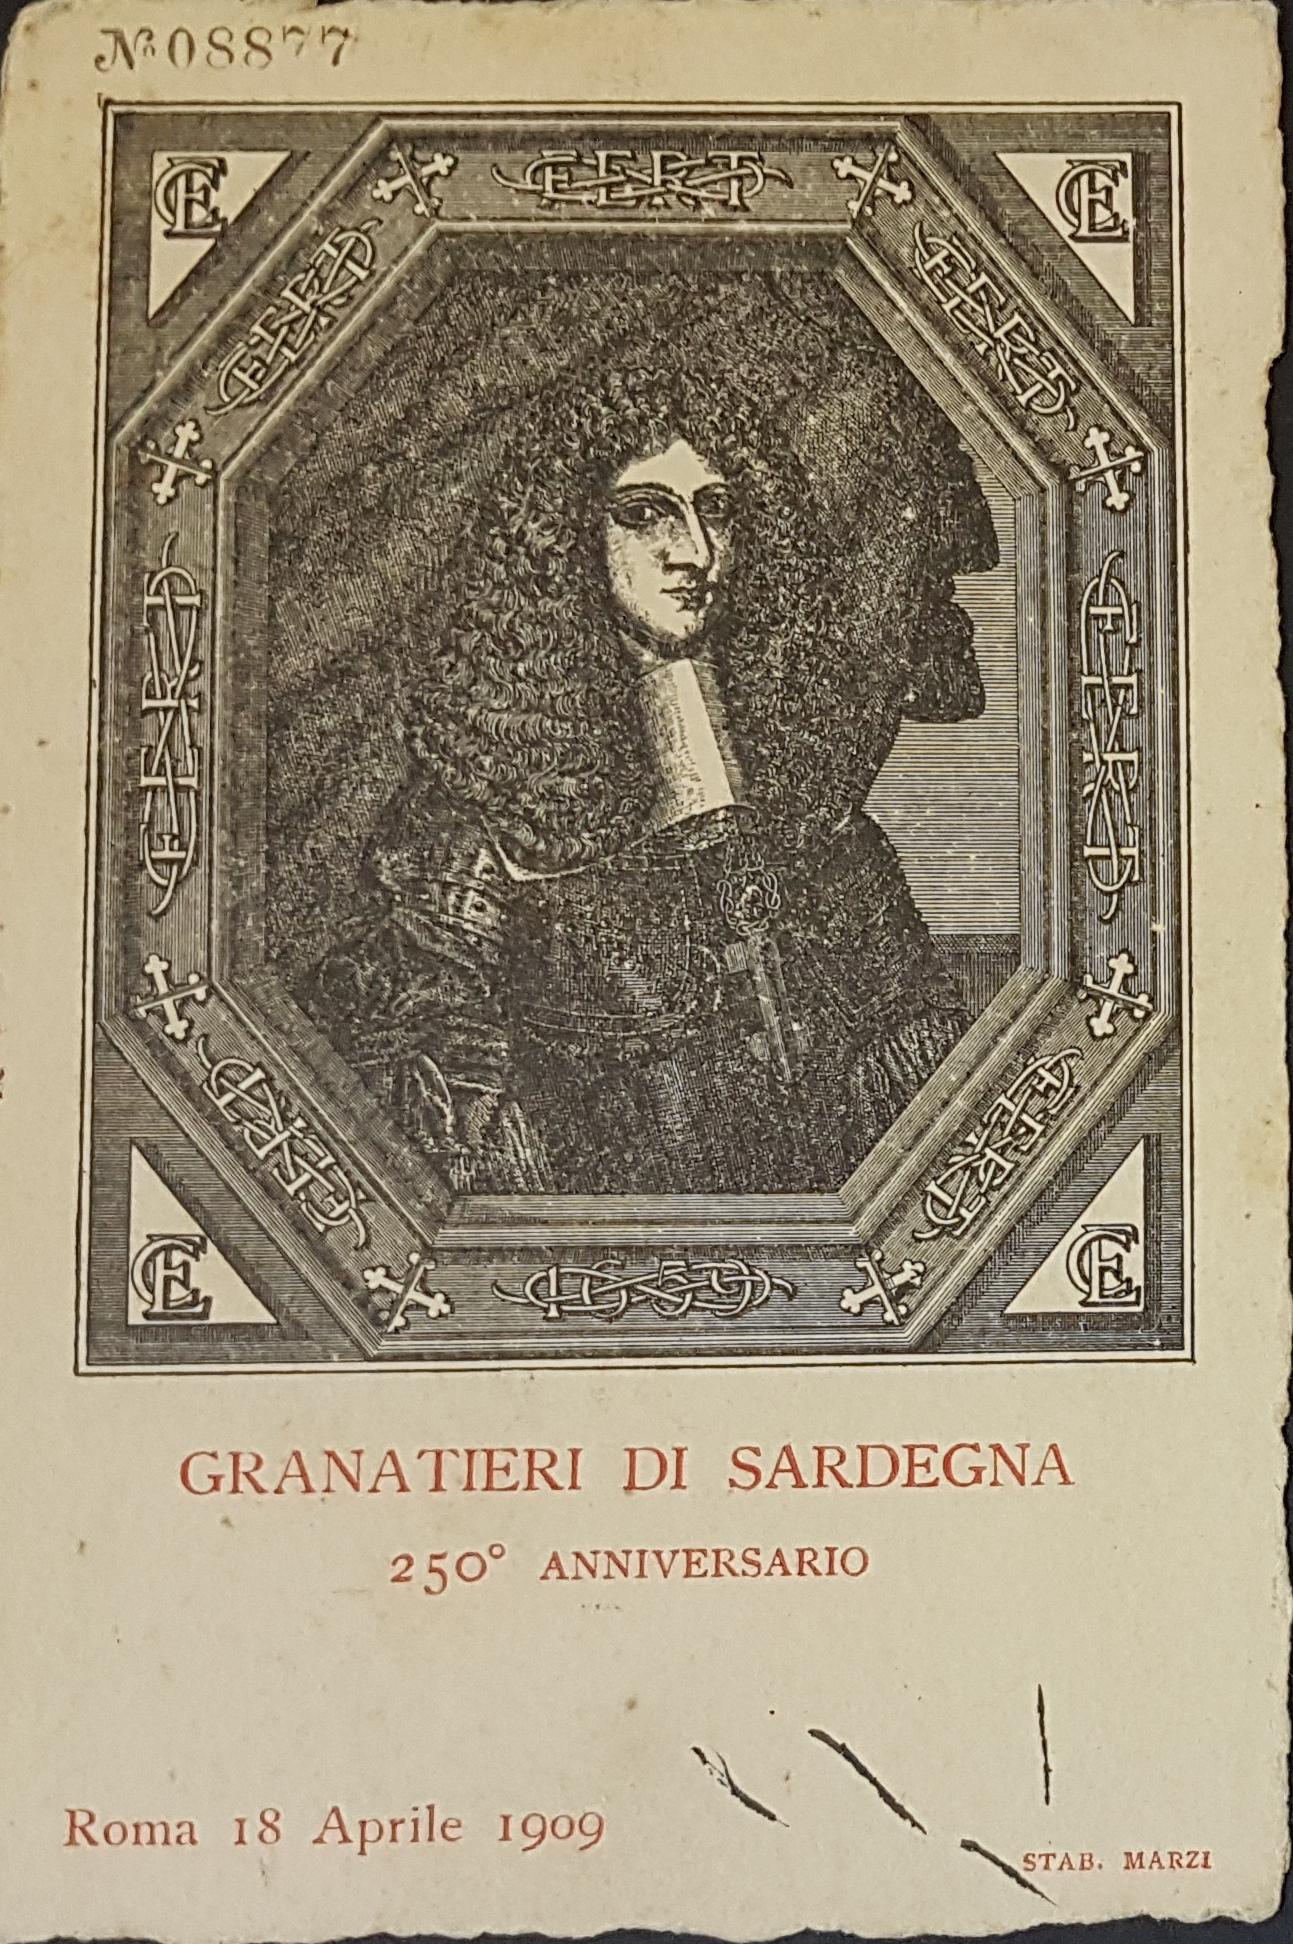 Il Fondatore - Carlo Emanuele II